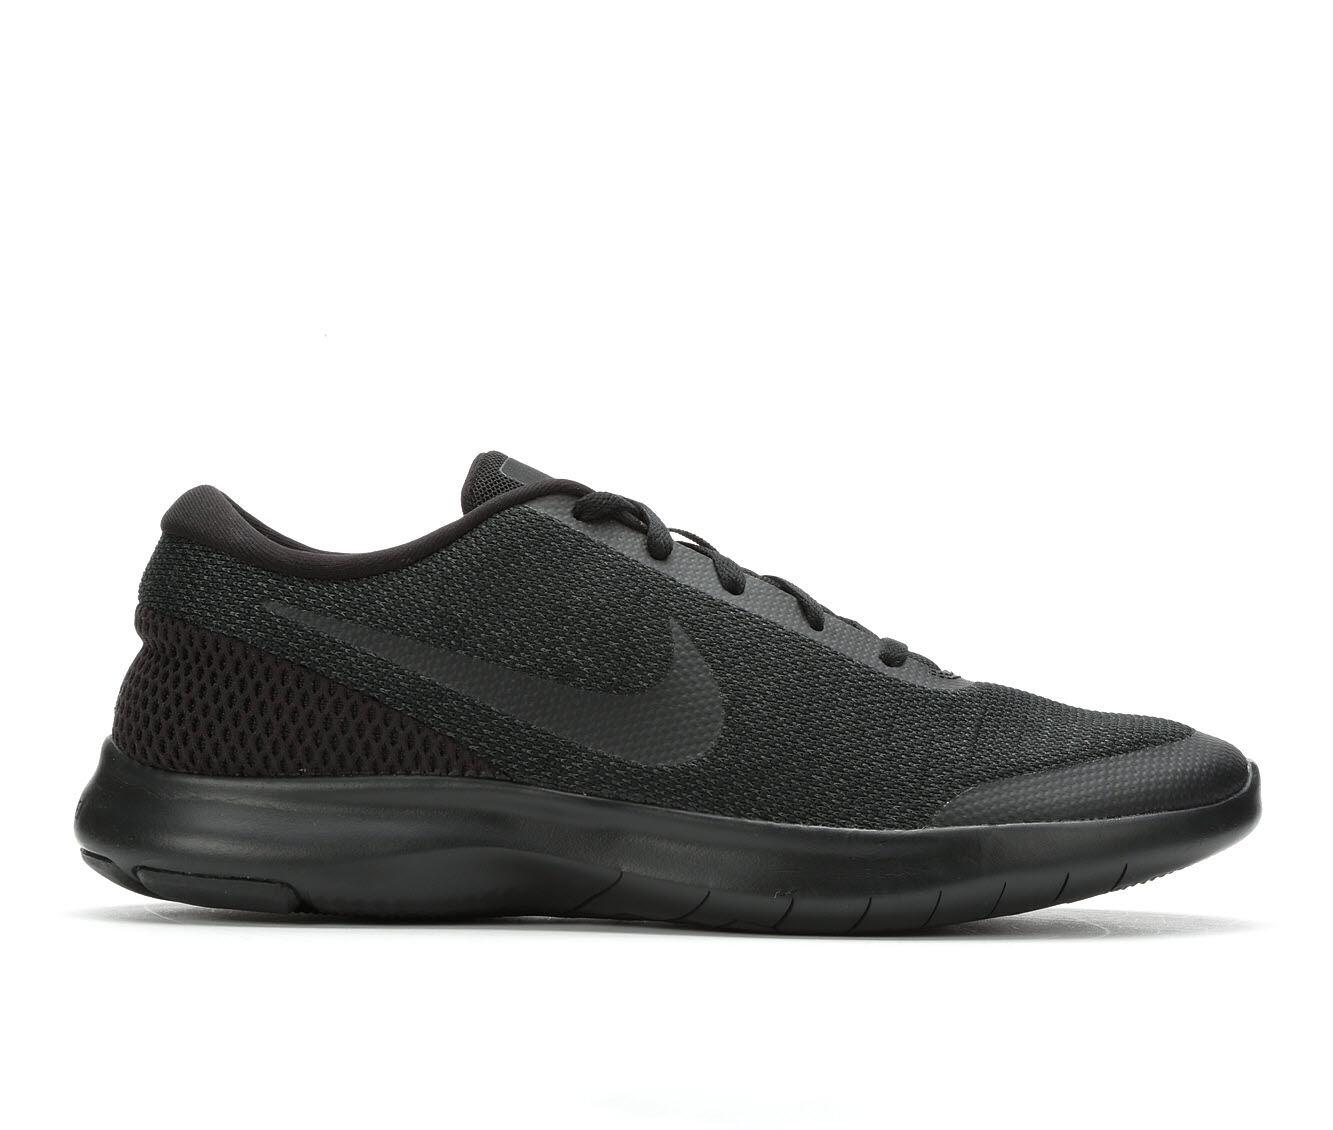 nike free run wide width mens slippers